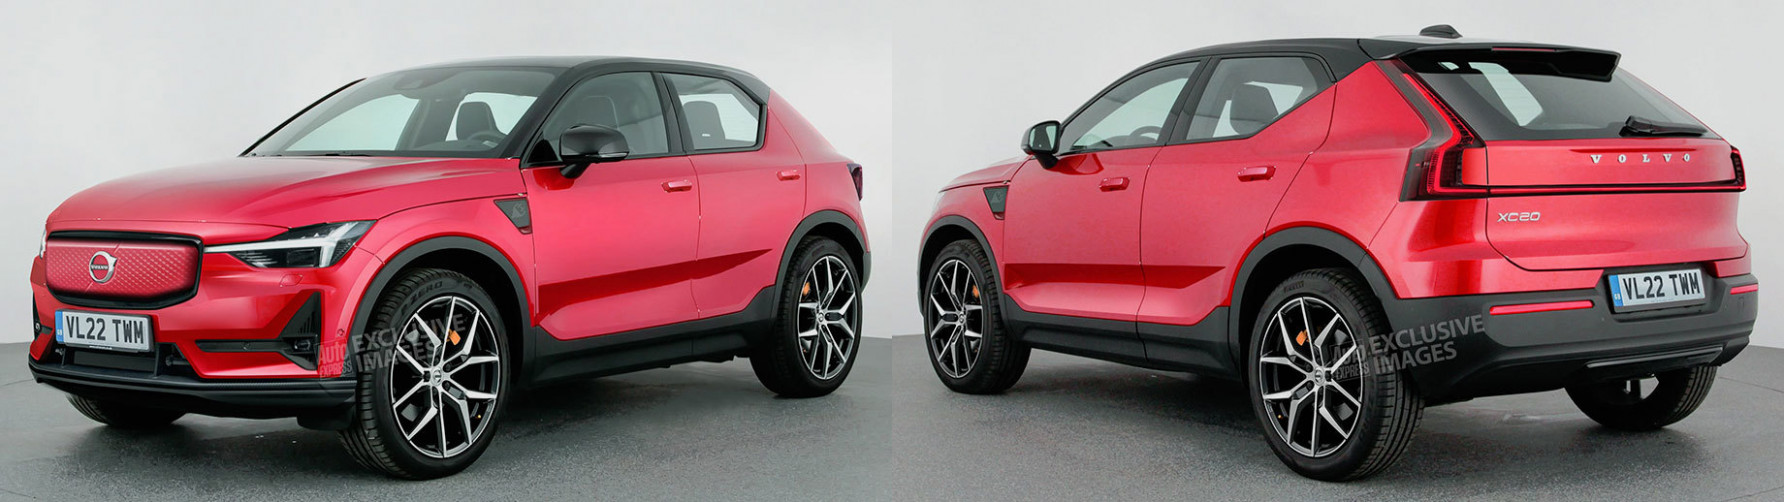 New Review Volvo New V40 2022